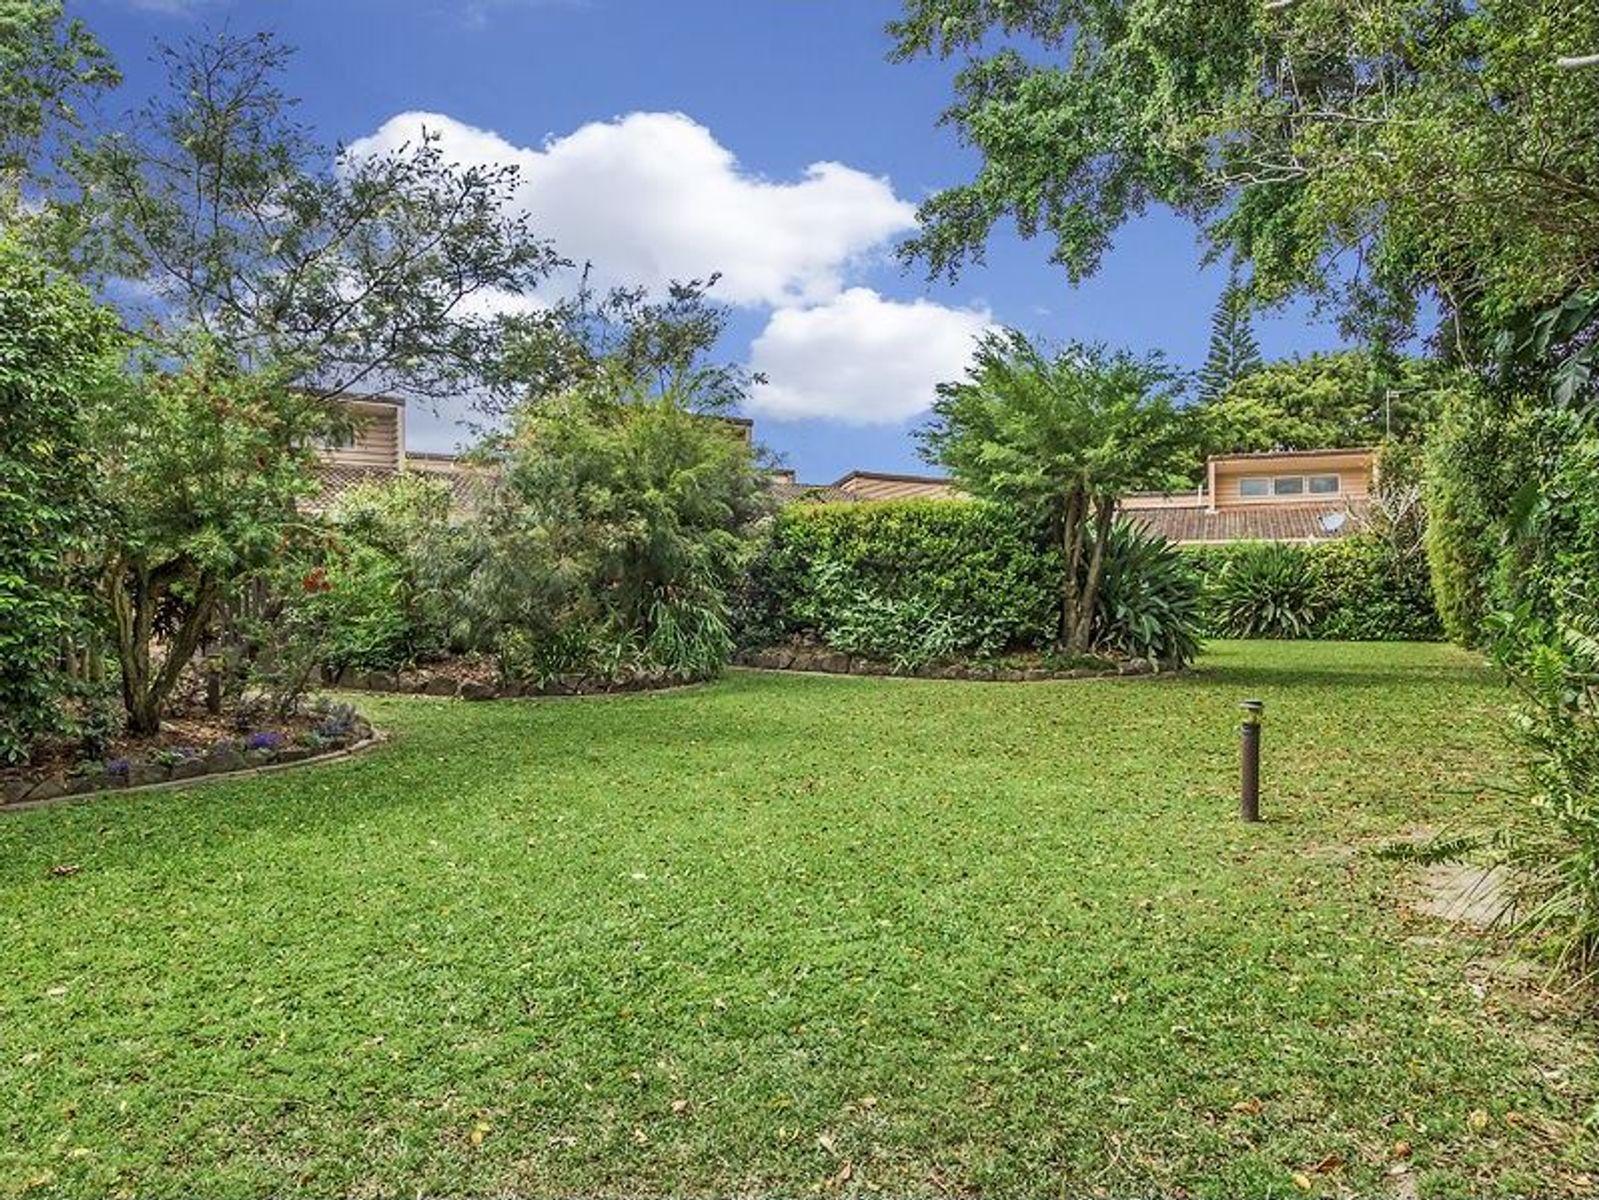 5/7 Wildwood Court, Bundall, QLD 4217